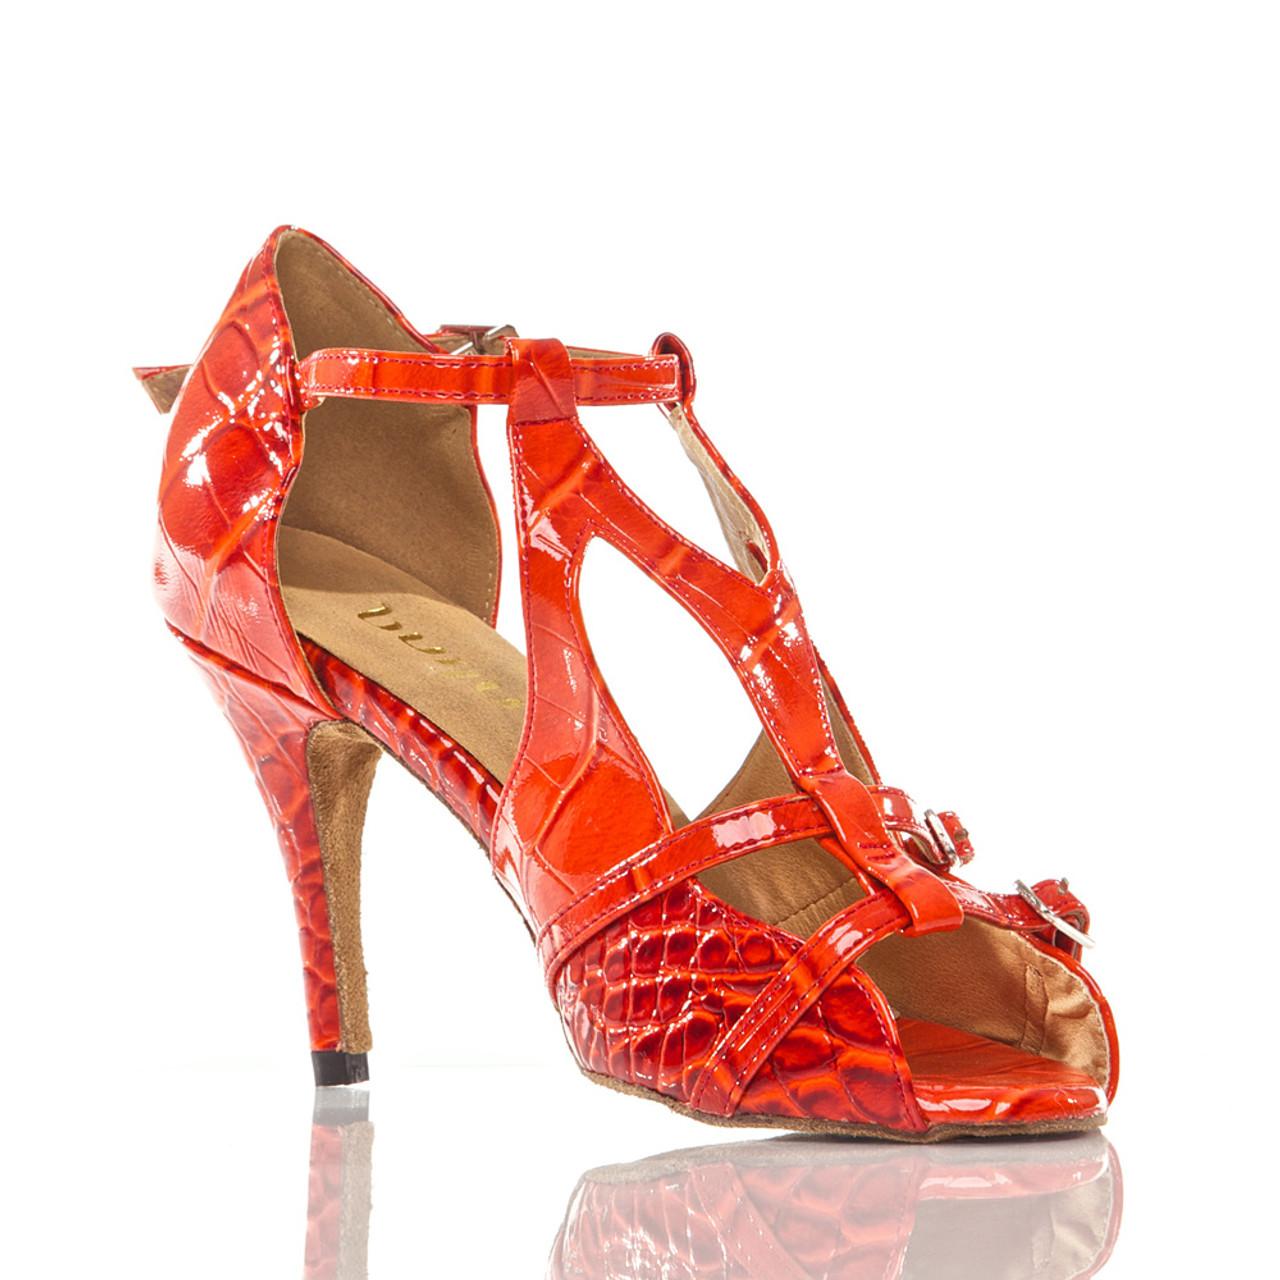 cf60d0477b1 Milandra - Adjustable Width Sexy Sandal - Custom Made To Order - B1228 -  Burju Shoes